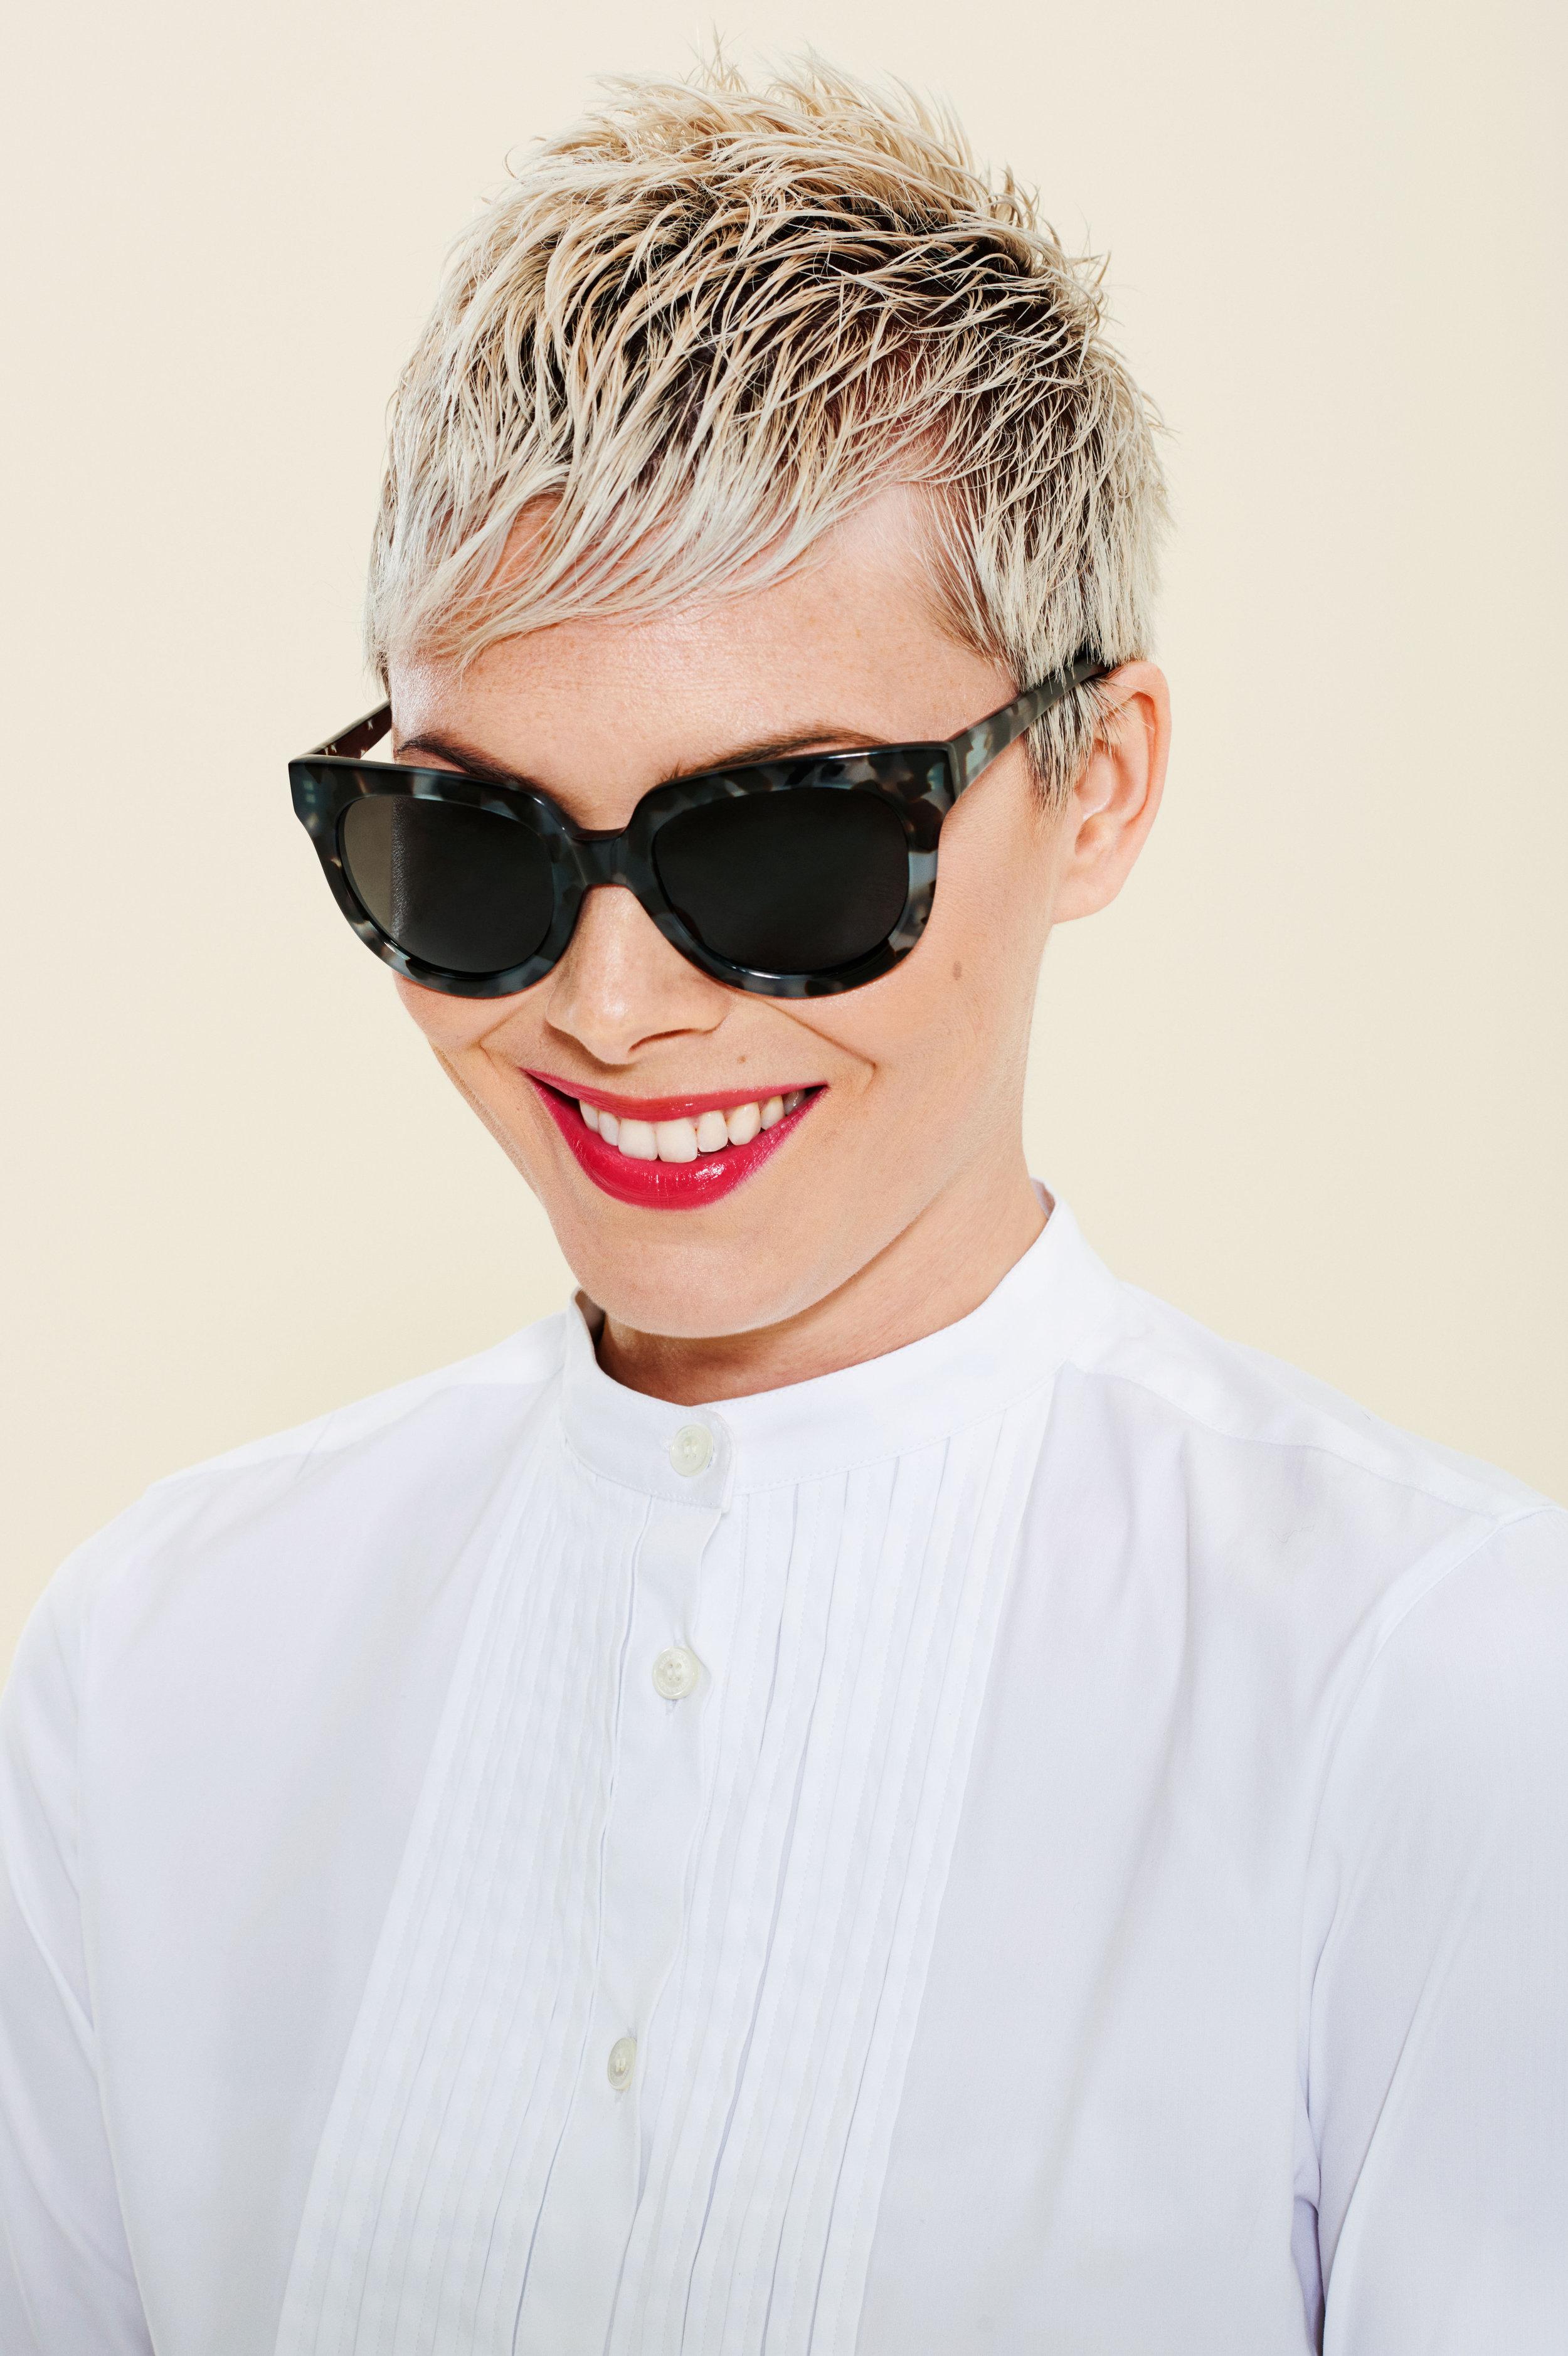 sunglasses-lipsticks-10.w4500.h6760.jpg